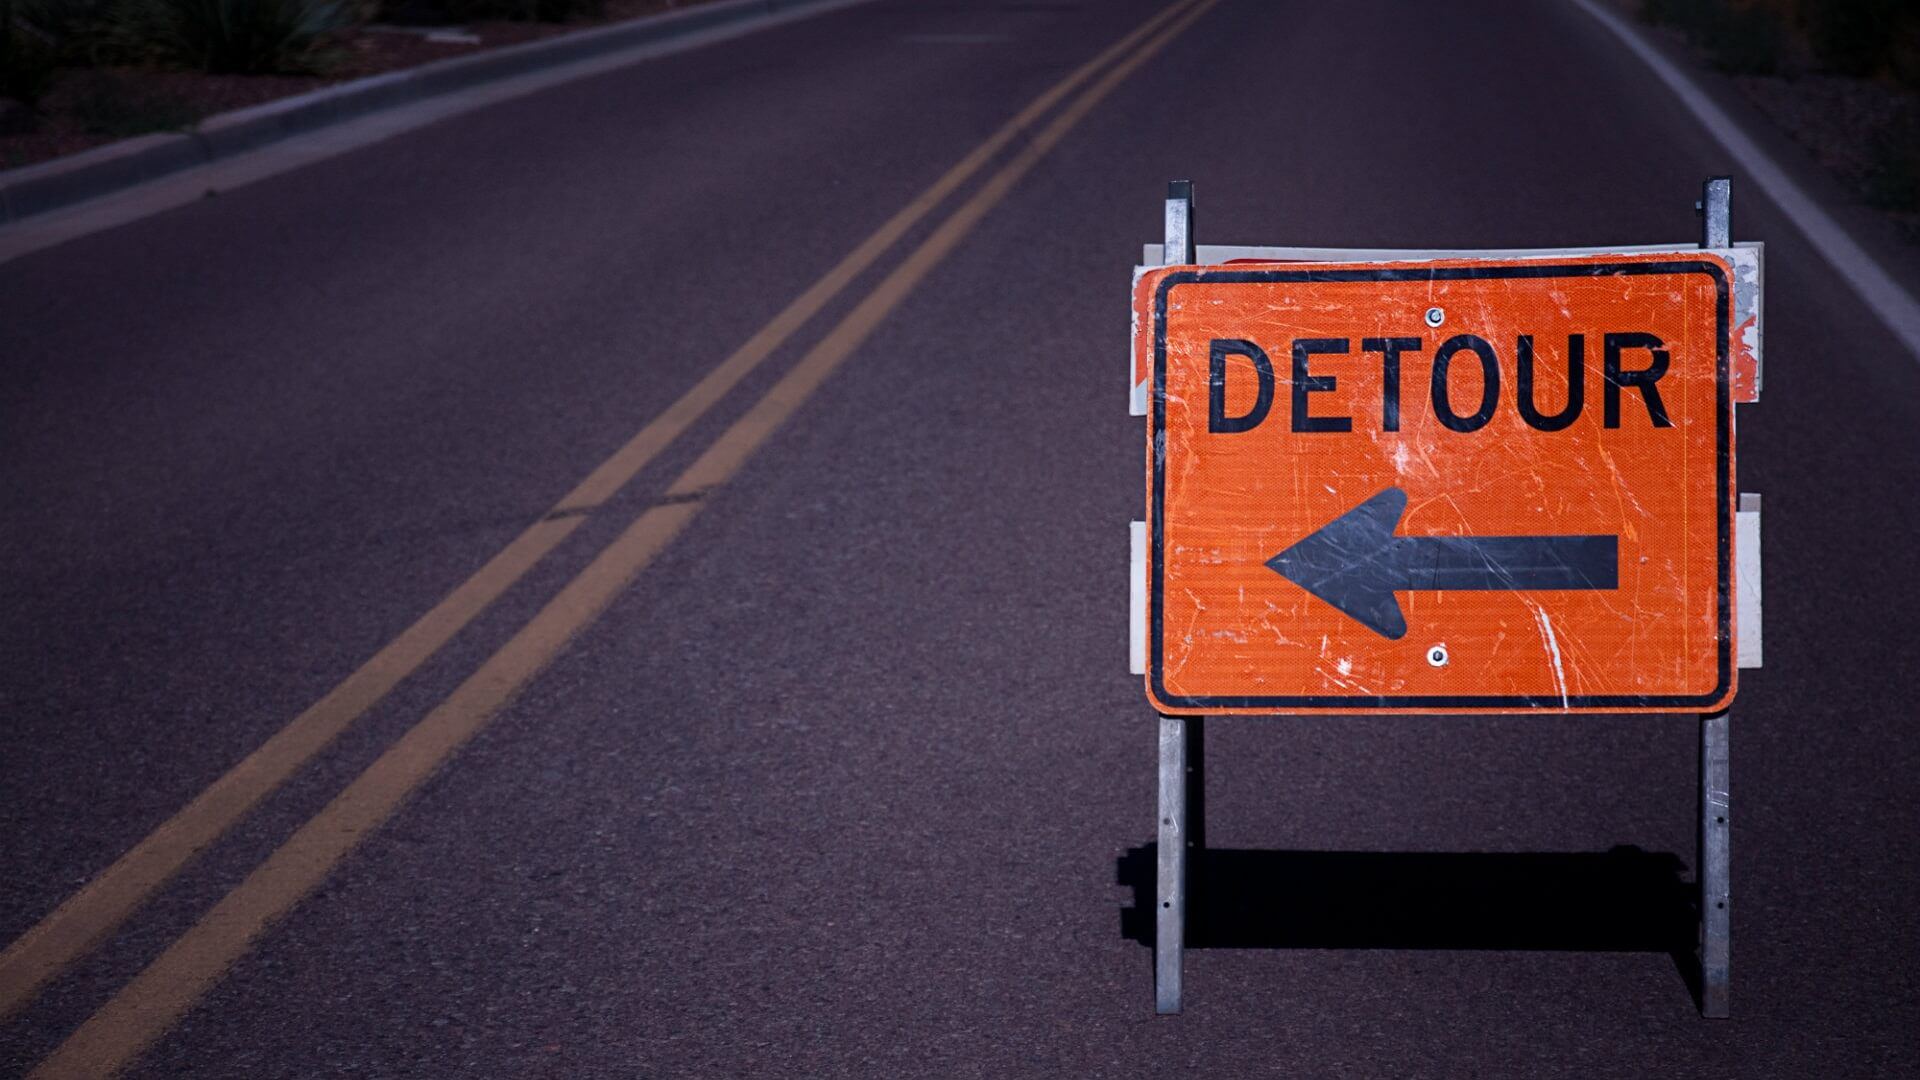 detour-301-redirect-road-ss-1920